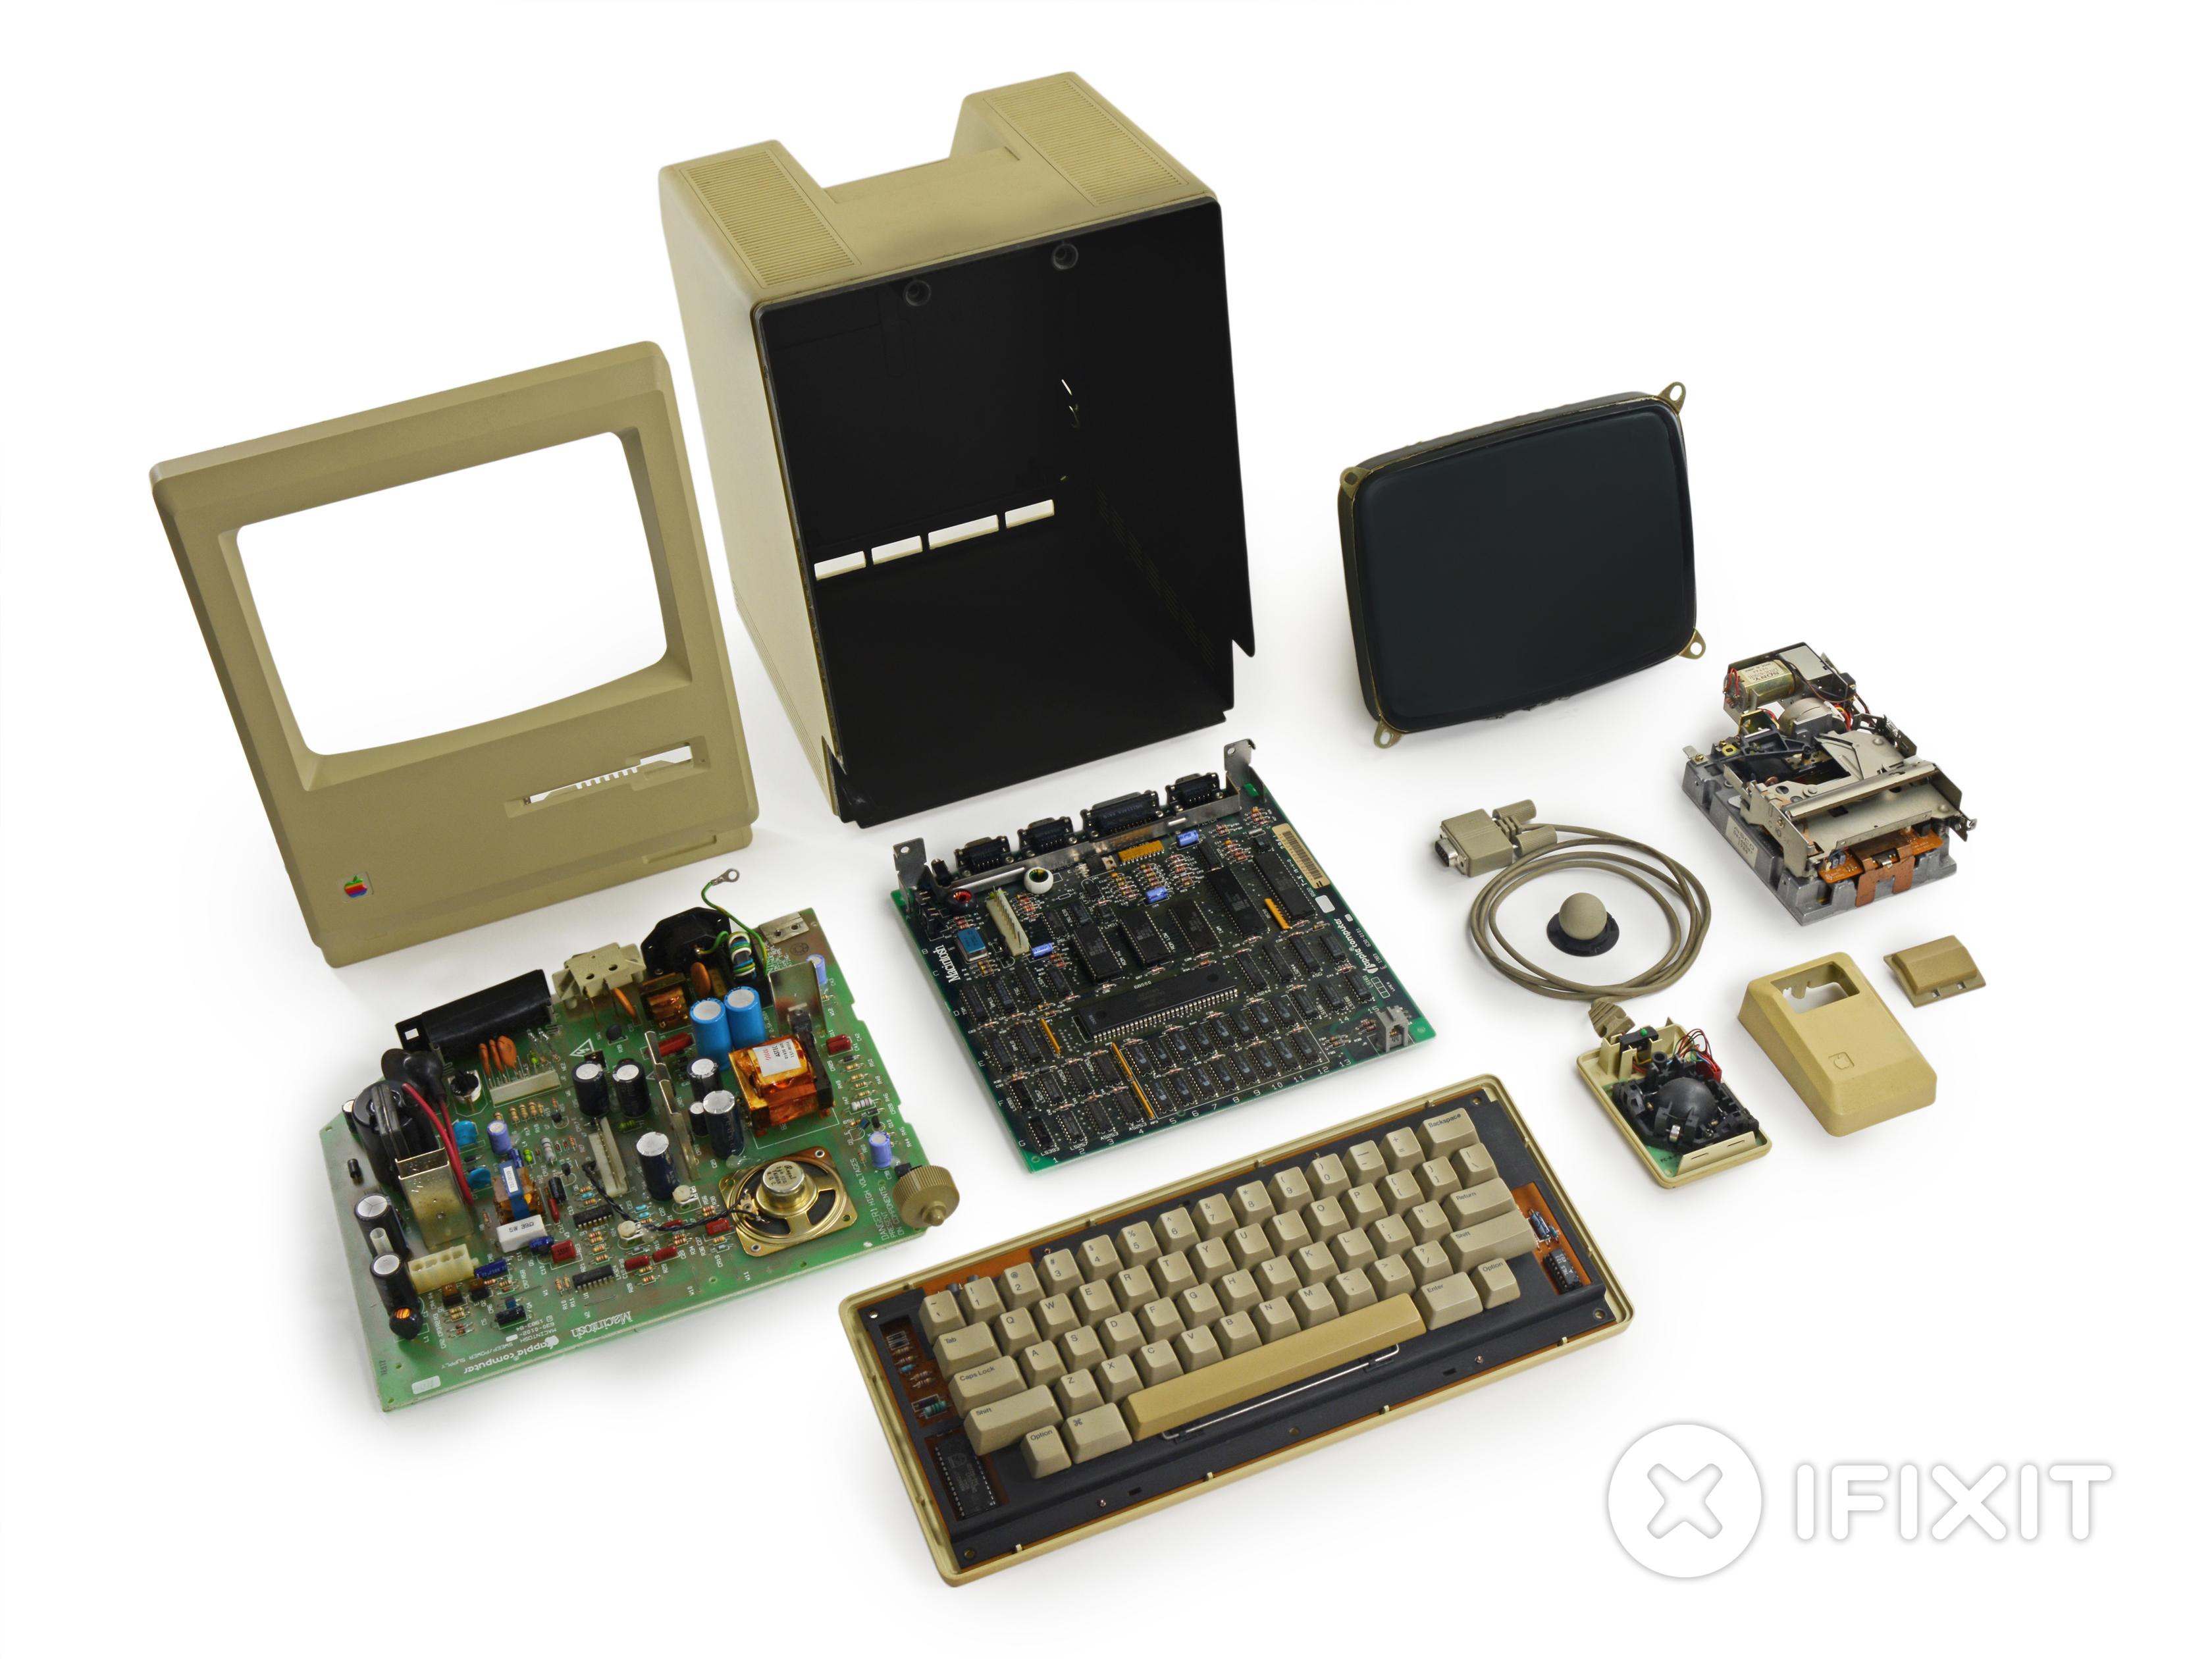 Macintosh 128k desmontado pela iFixit